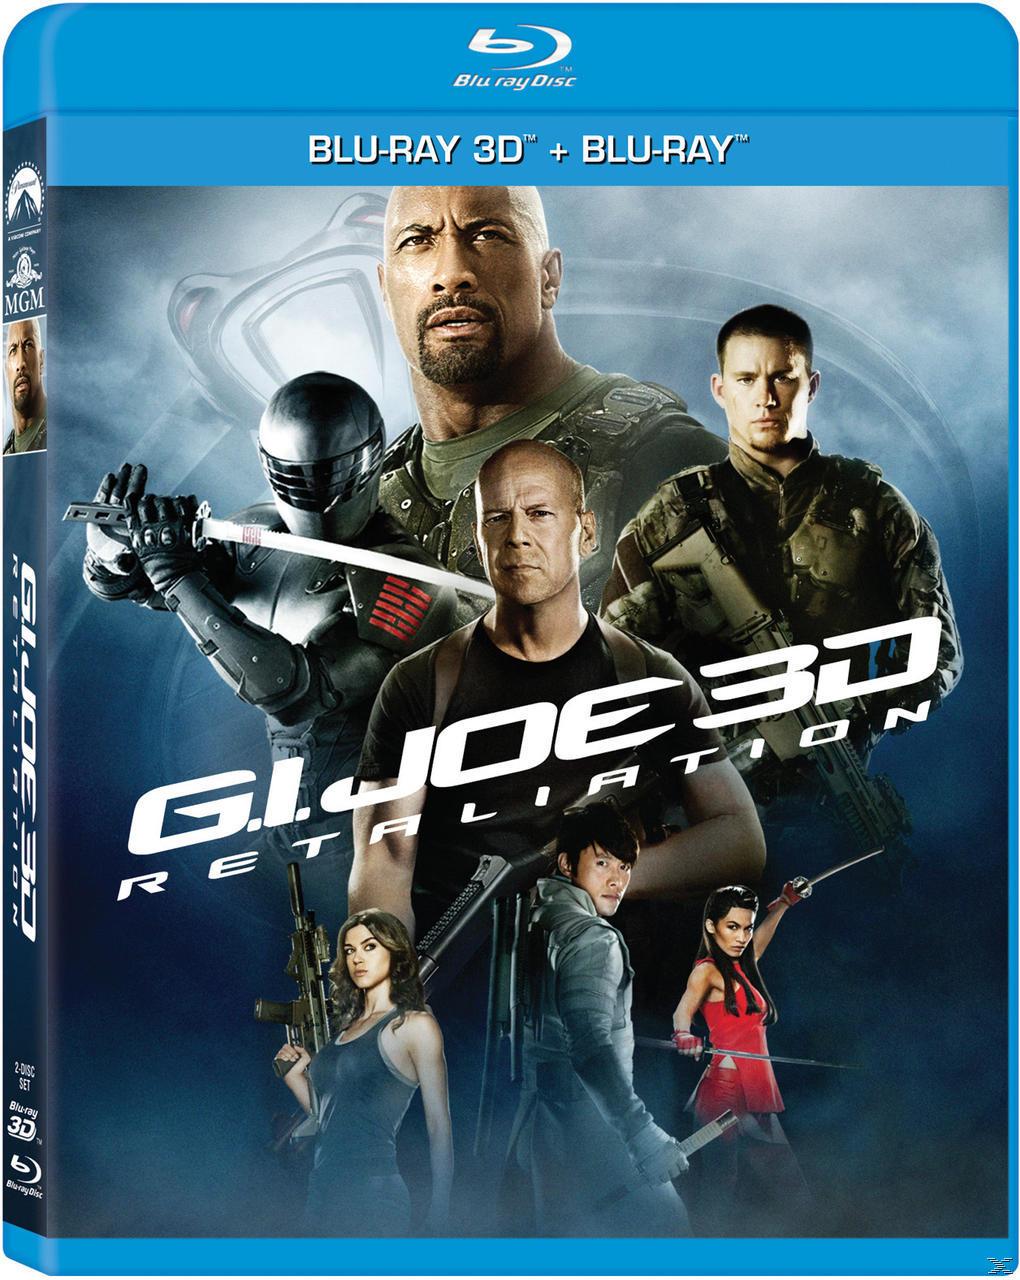 G.I. Joe: Aντίποινα - 2 Disc Bluray